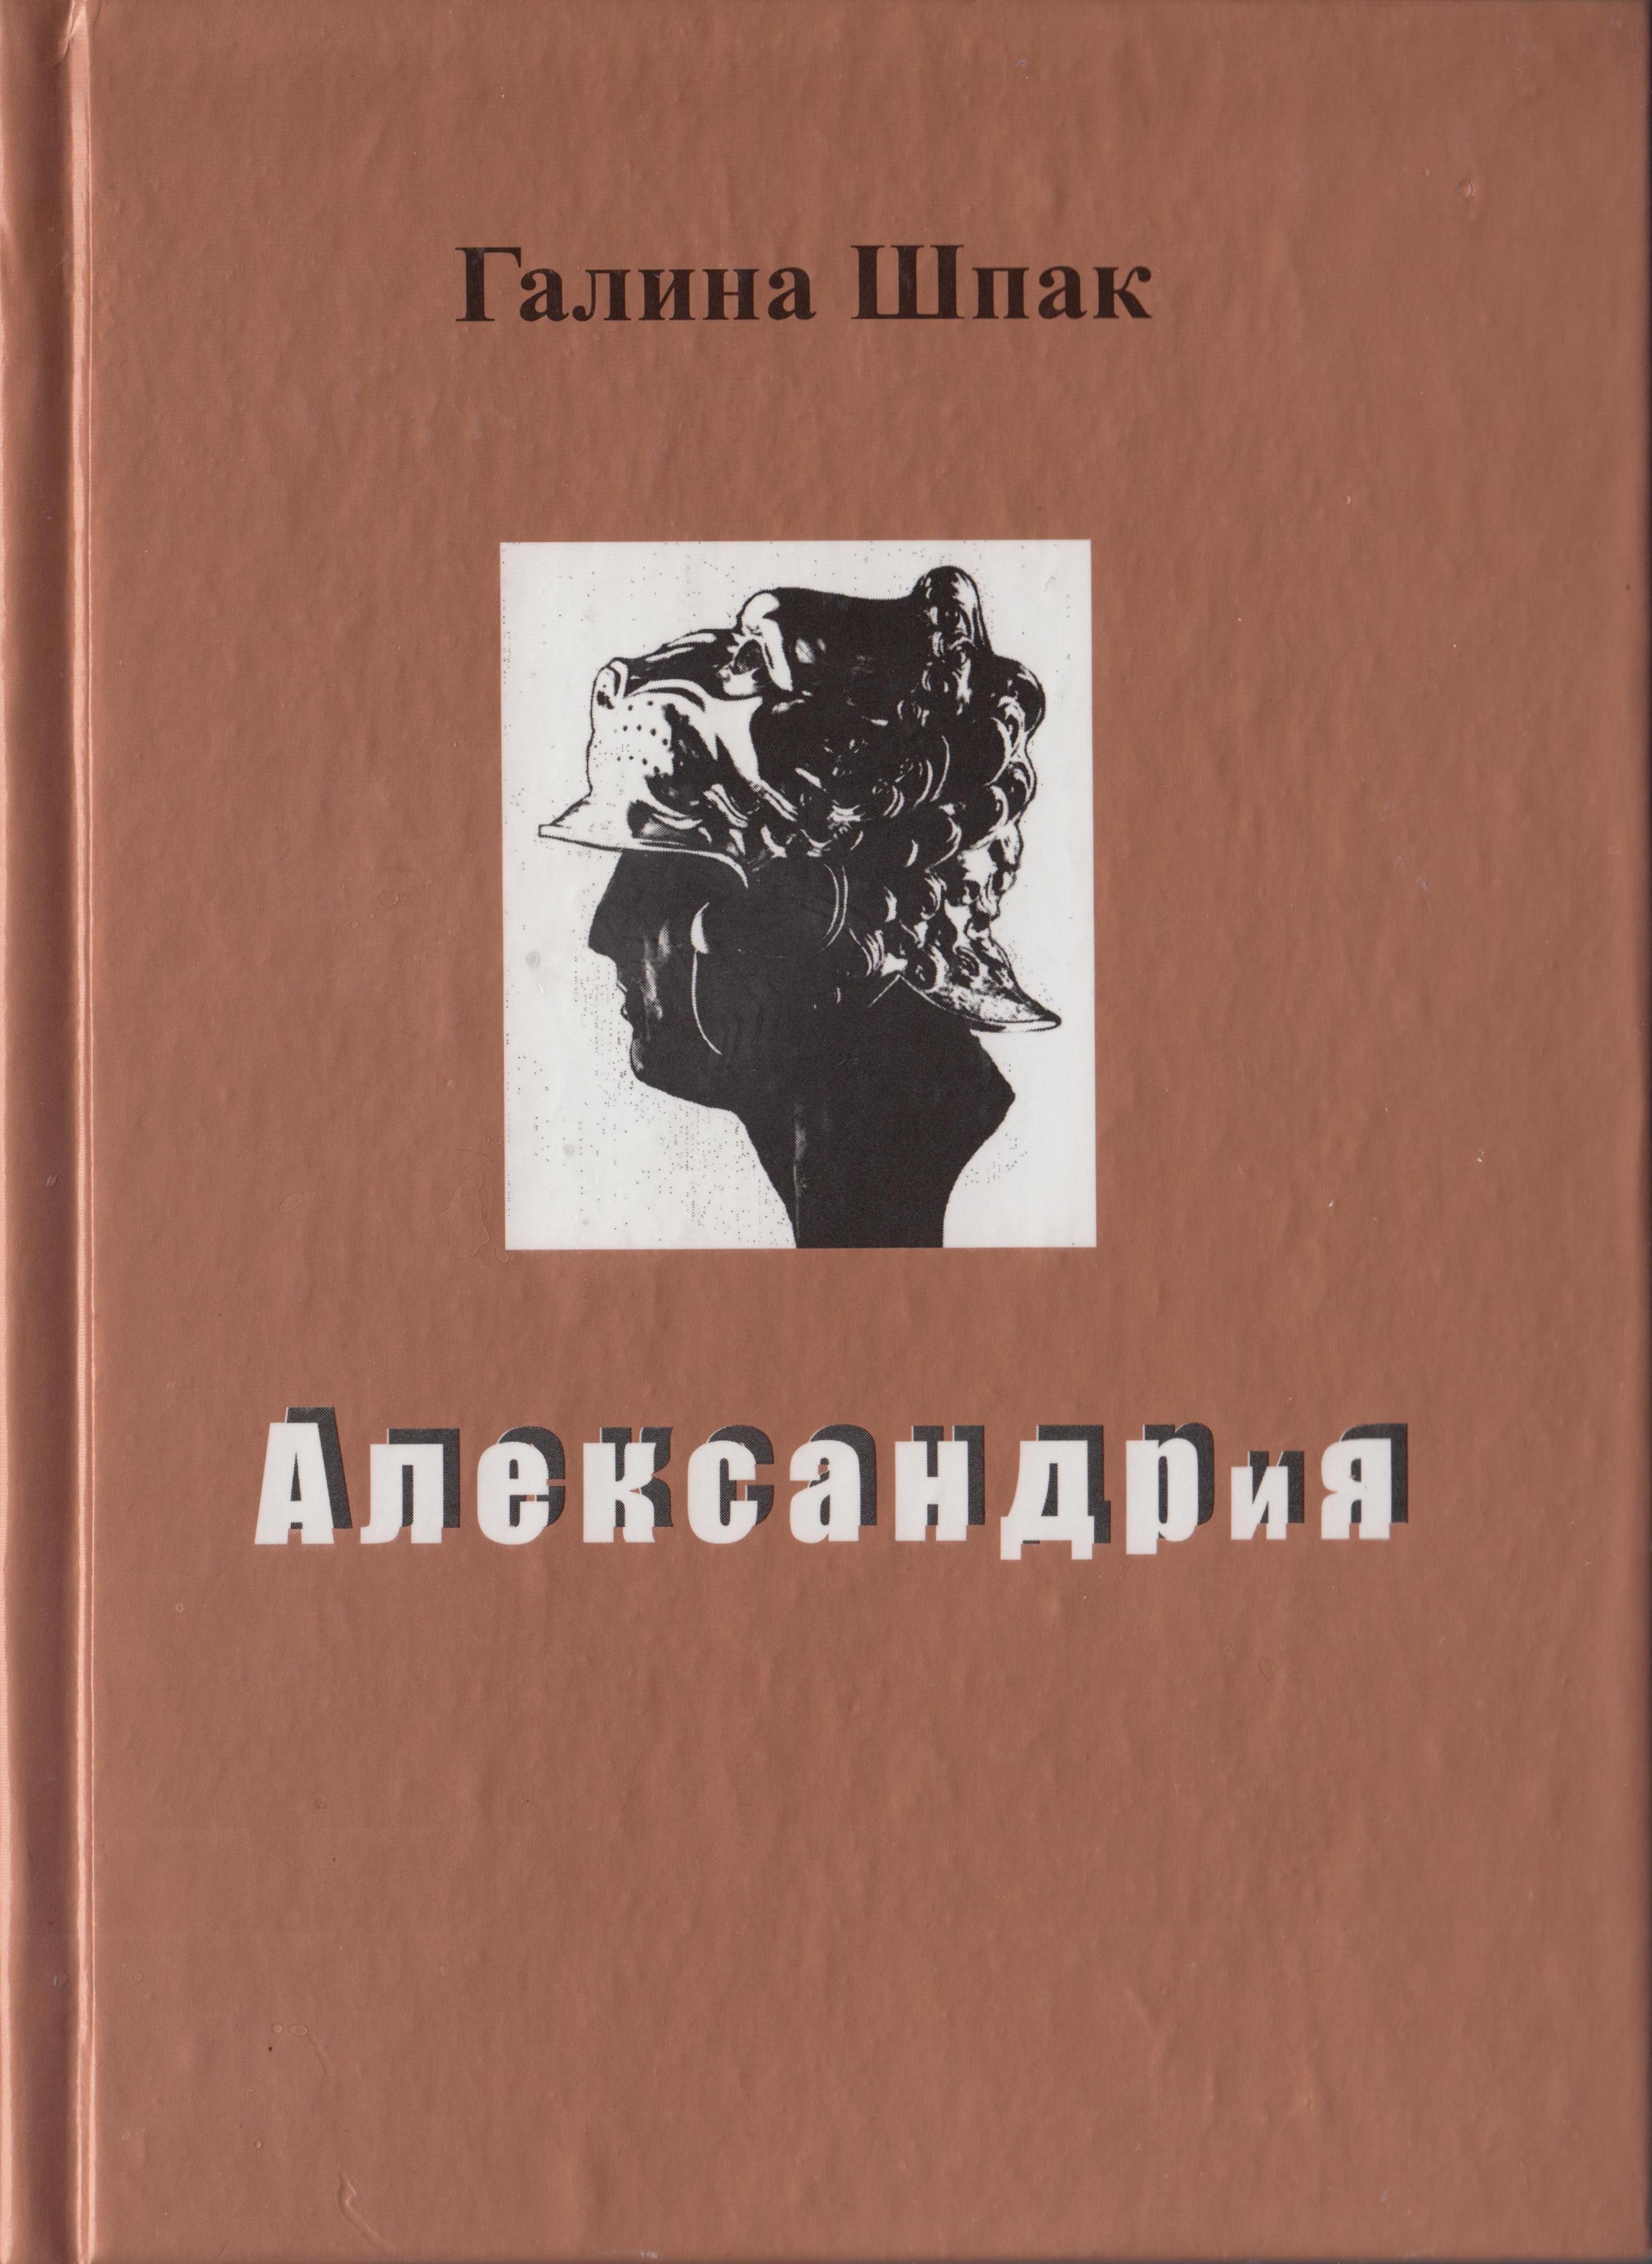 Г. Шпак - Александрия